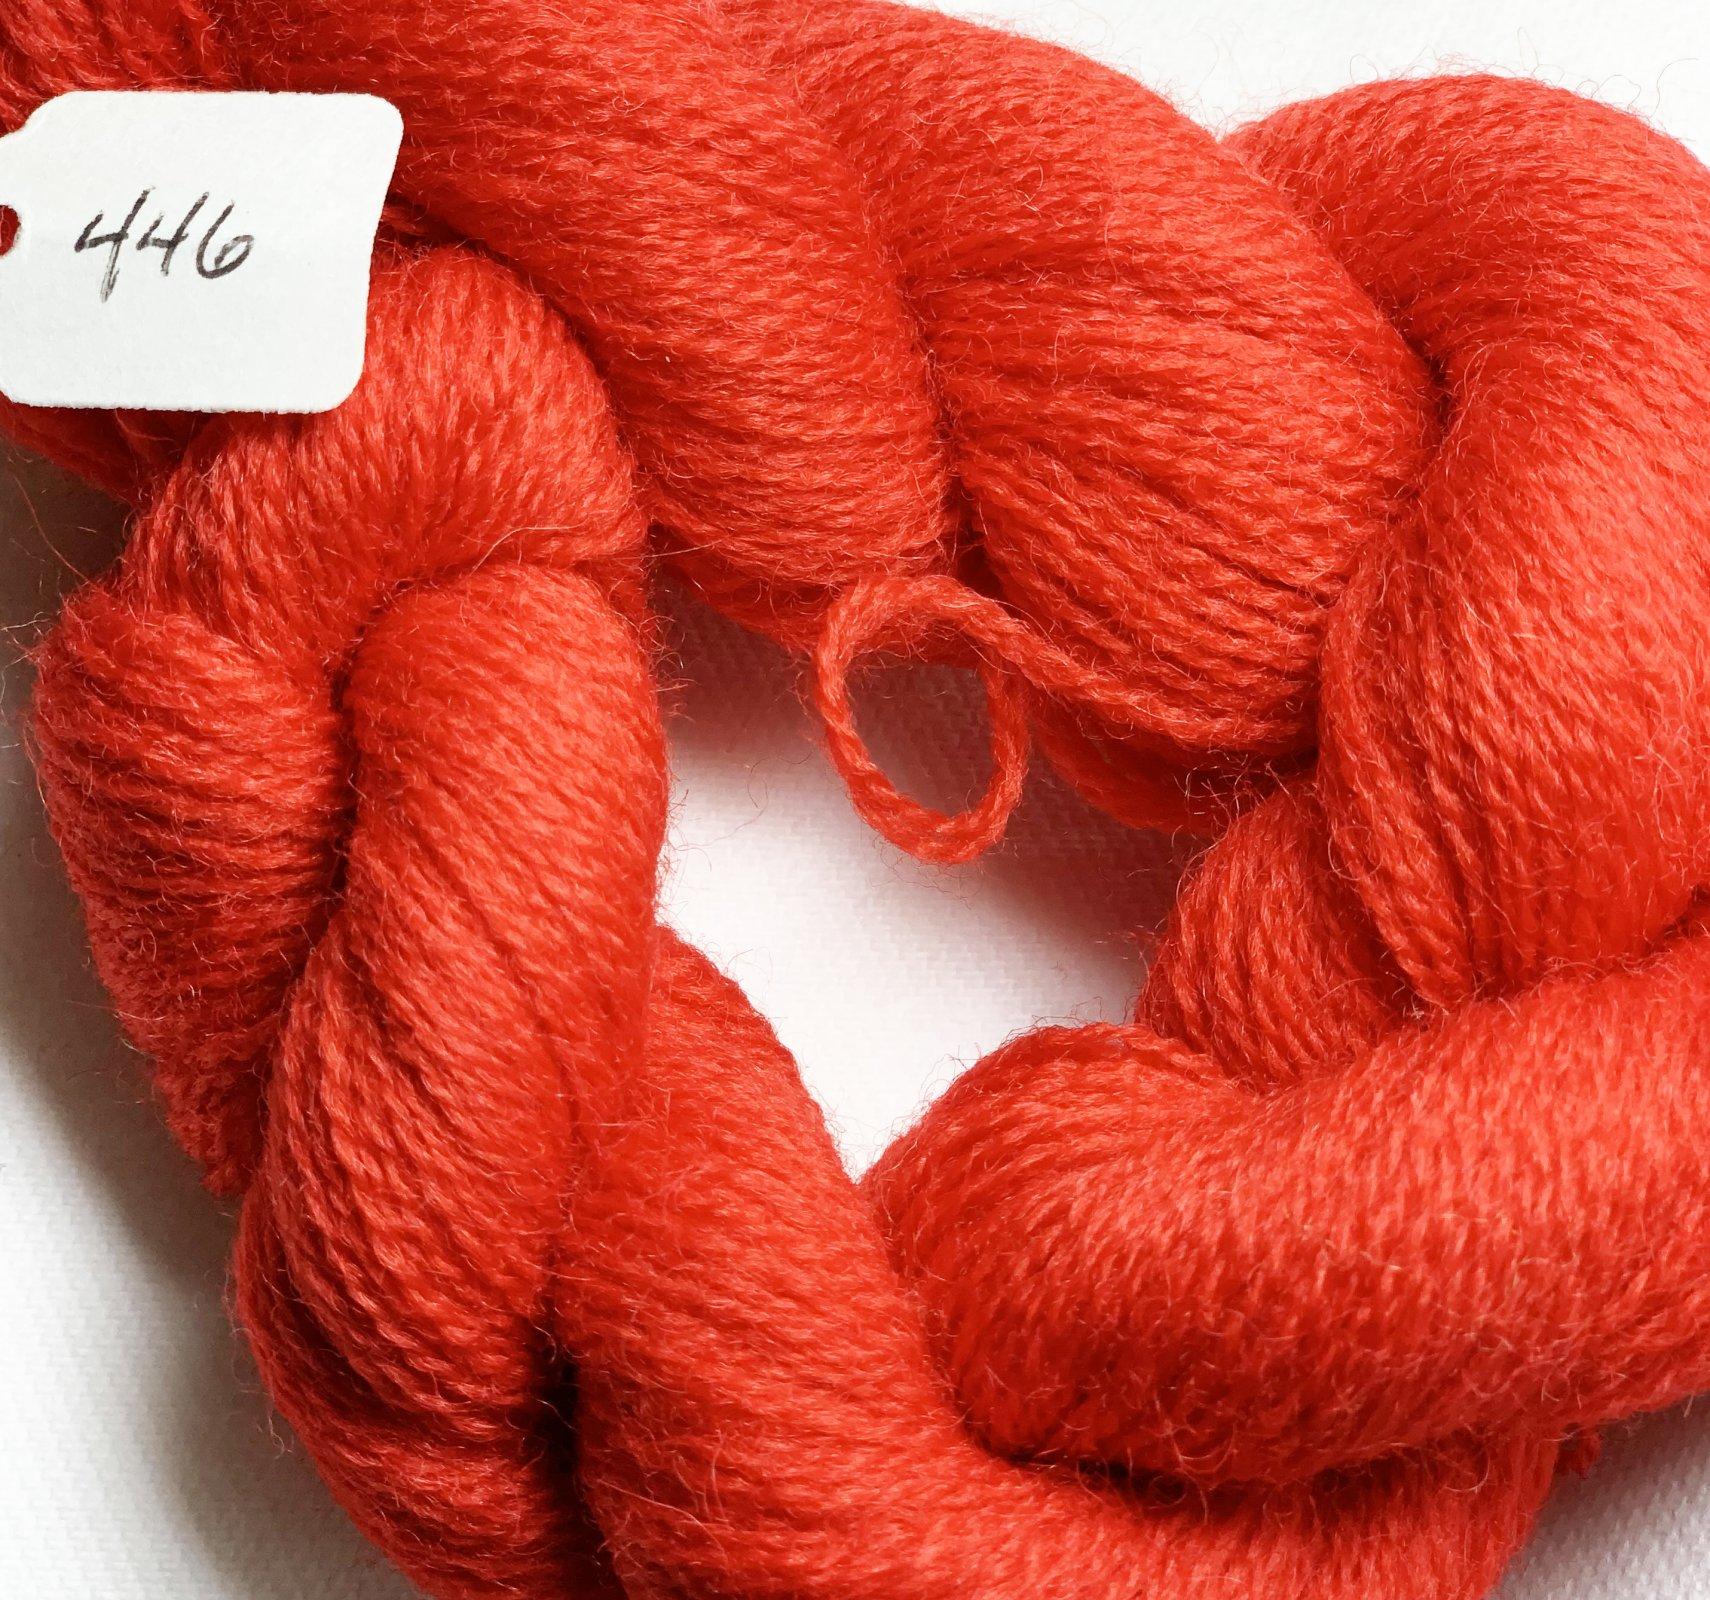 APP-446-ORANGE RED-HANK